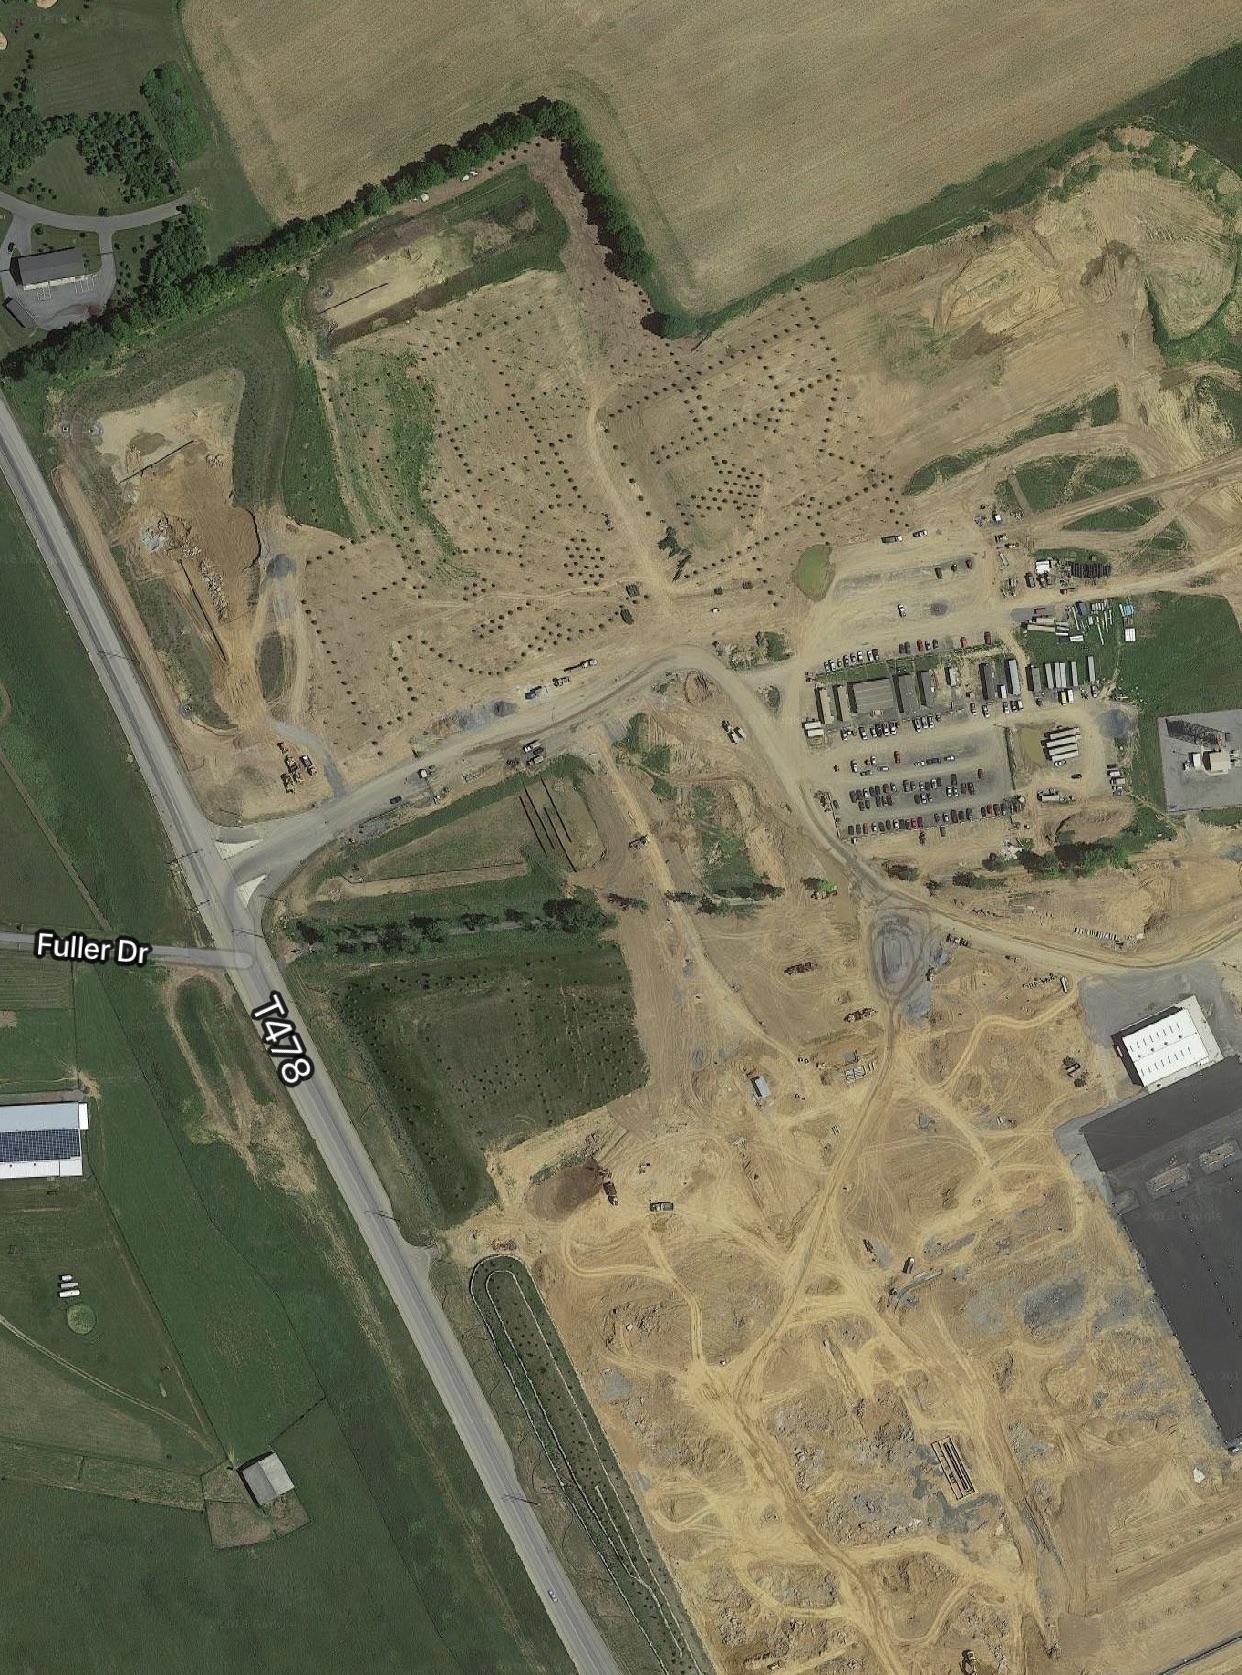 Fedex Google Maps : fedex, google, Google, Lehigh, Valley, Notice, Planted, Trees, FedEx